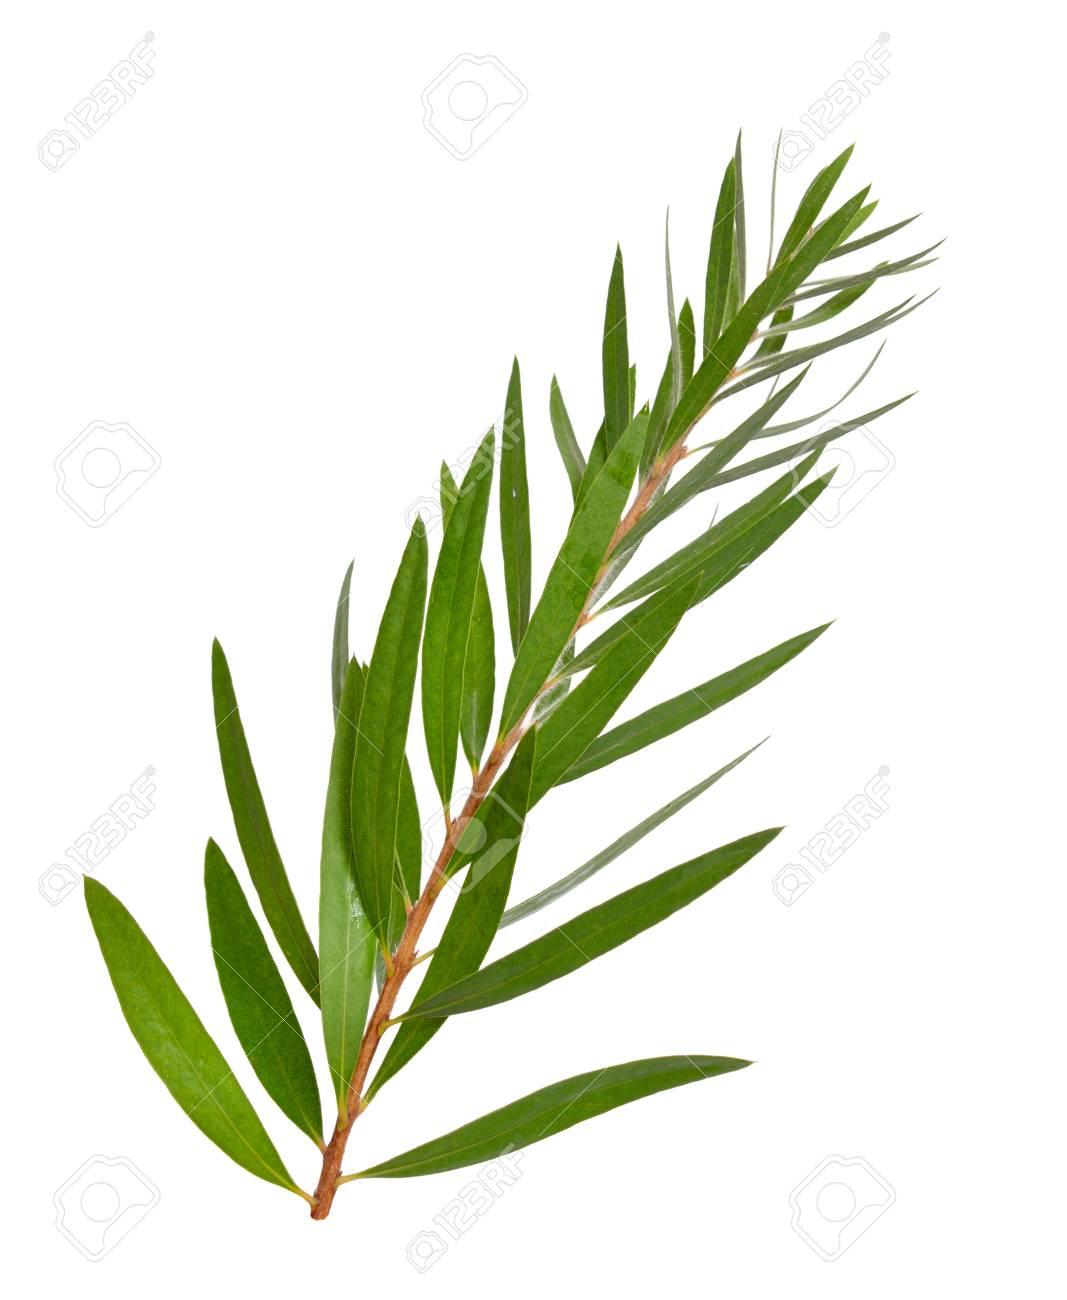 Melaleuca tea tree twig. Isolated on white background. - 104717888